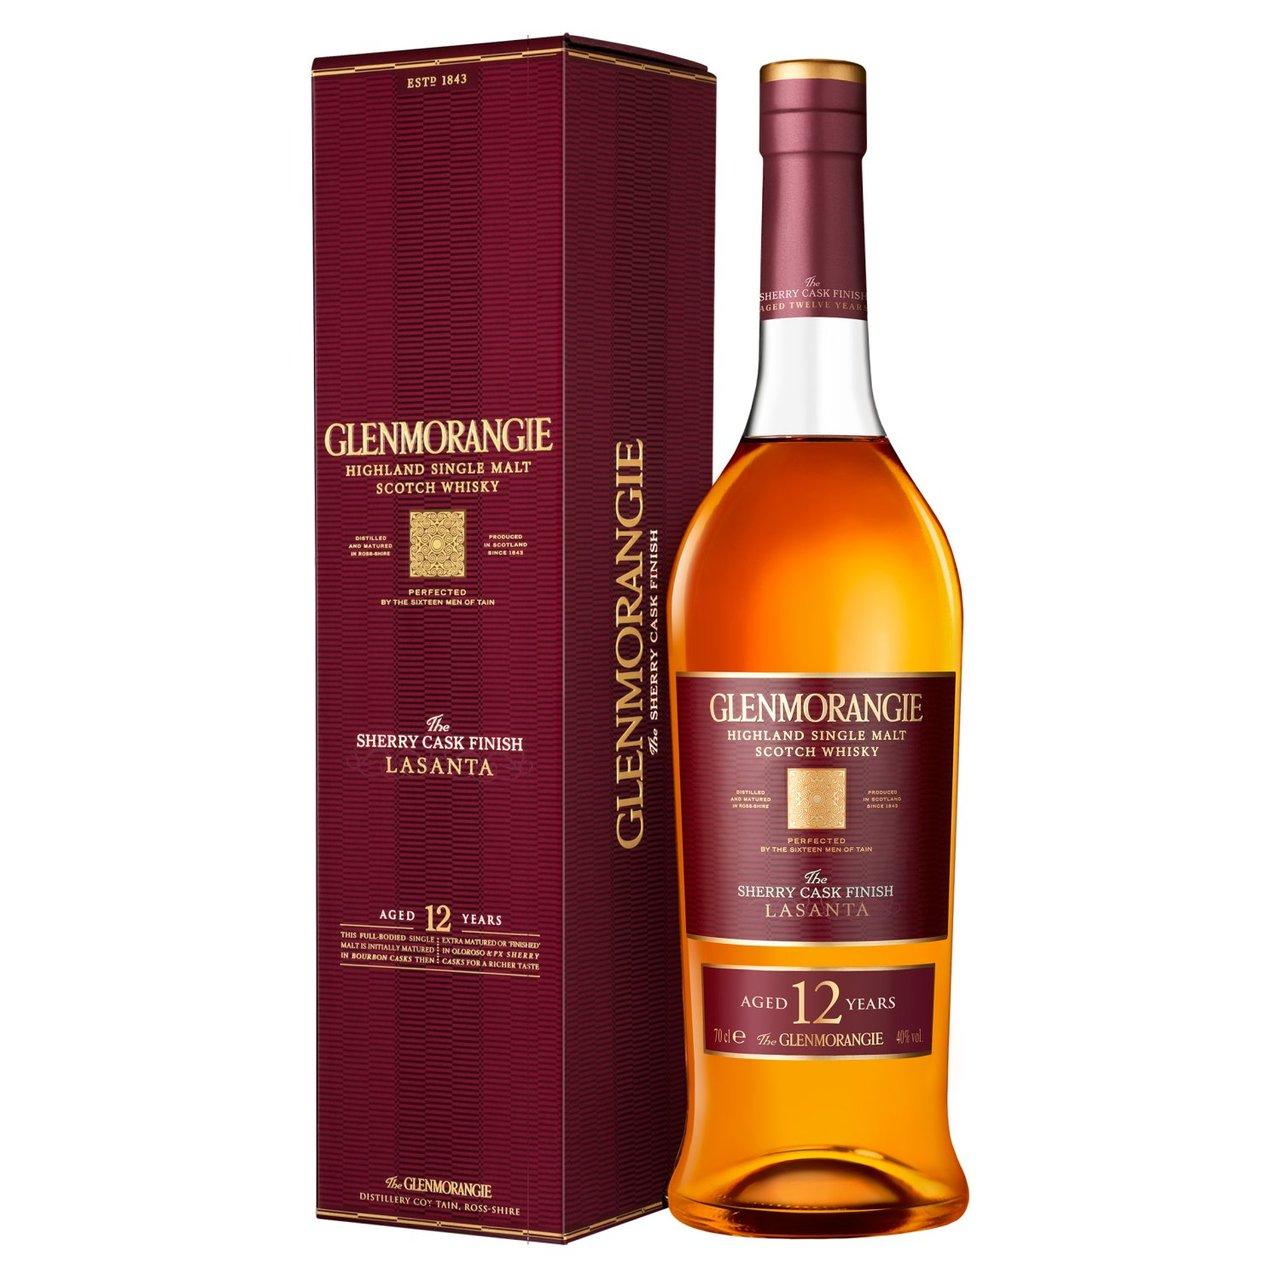 Glenmorangie Lasanta Single Malt Scotch Whisky70cl - £37 @ Ocado